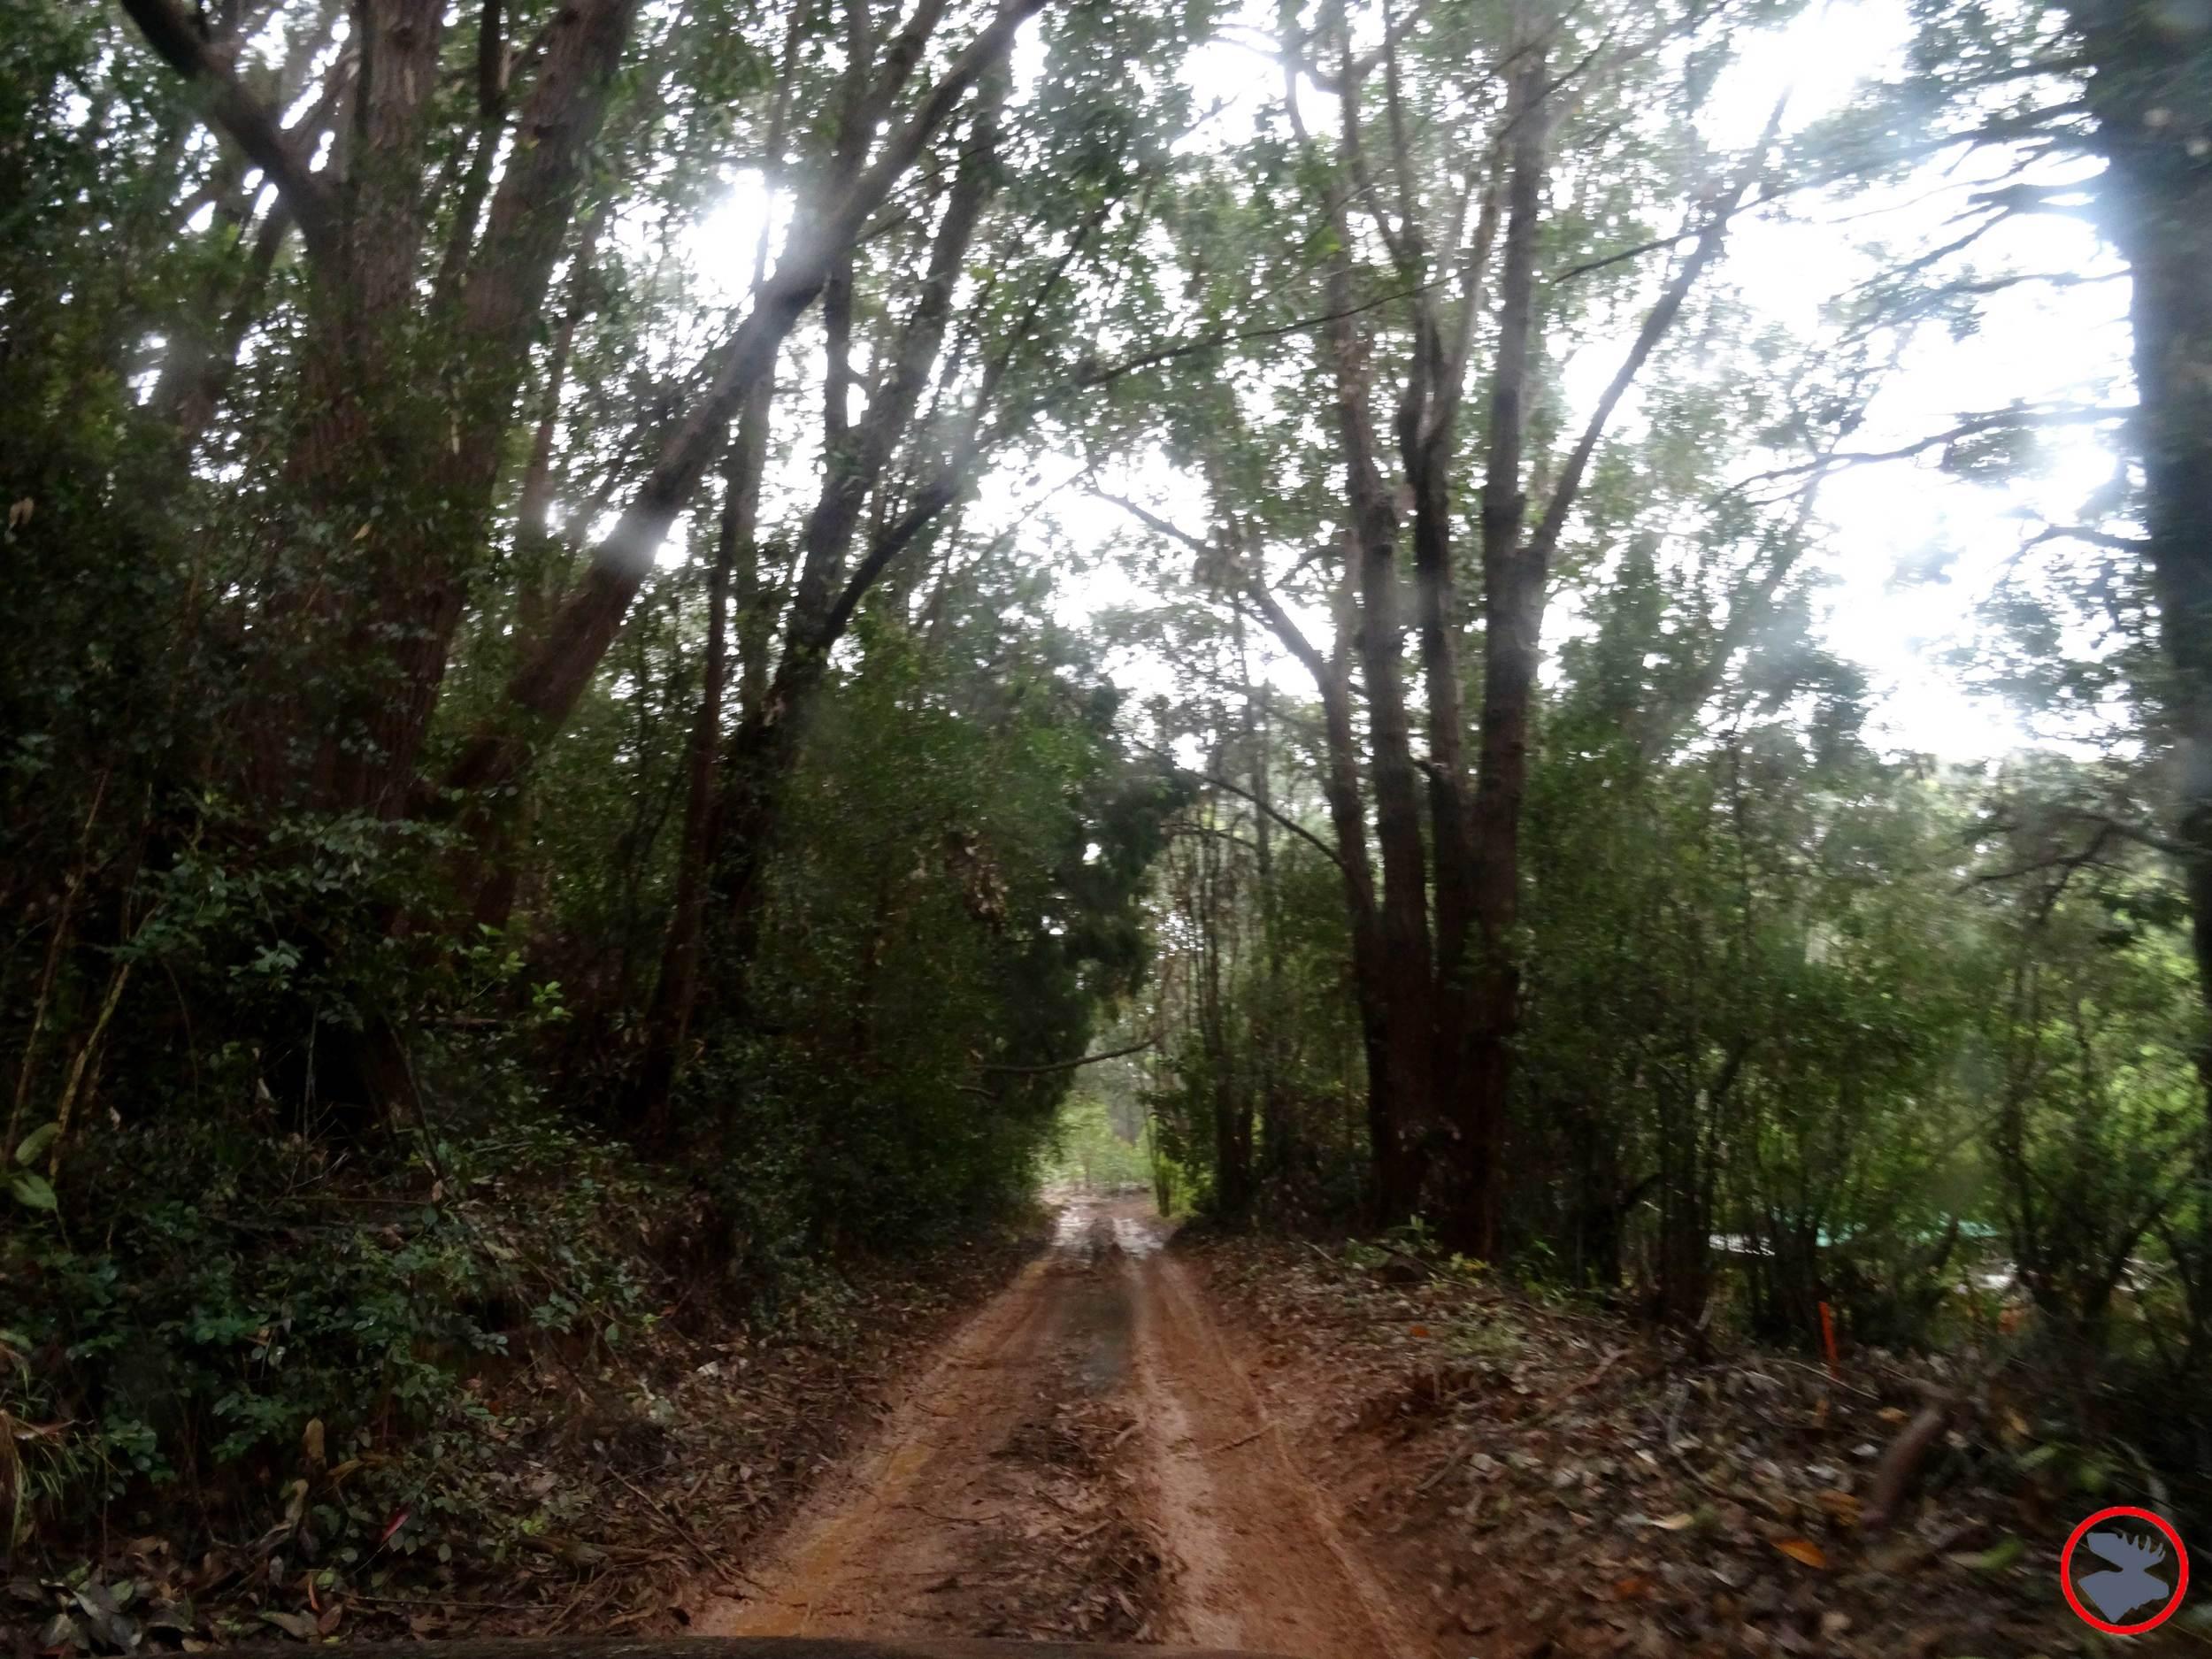 Road-to-BSA-Camp.jpg